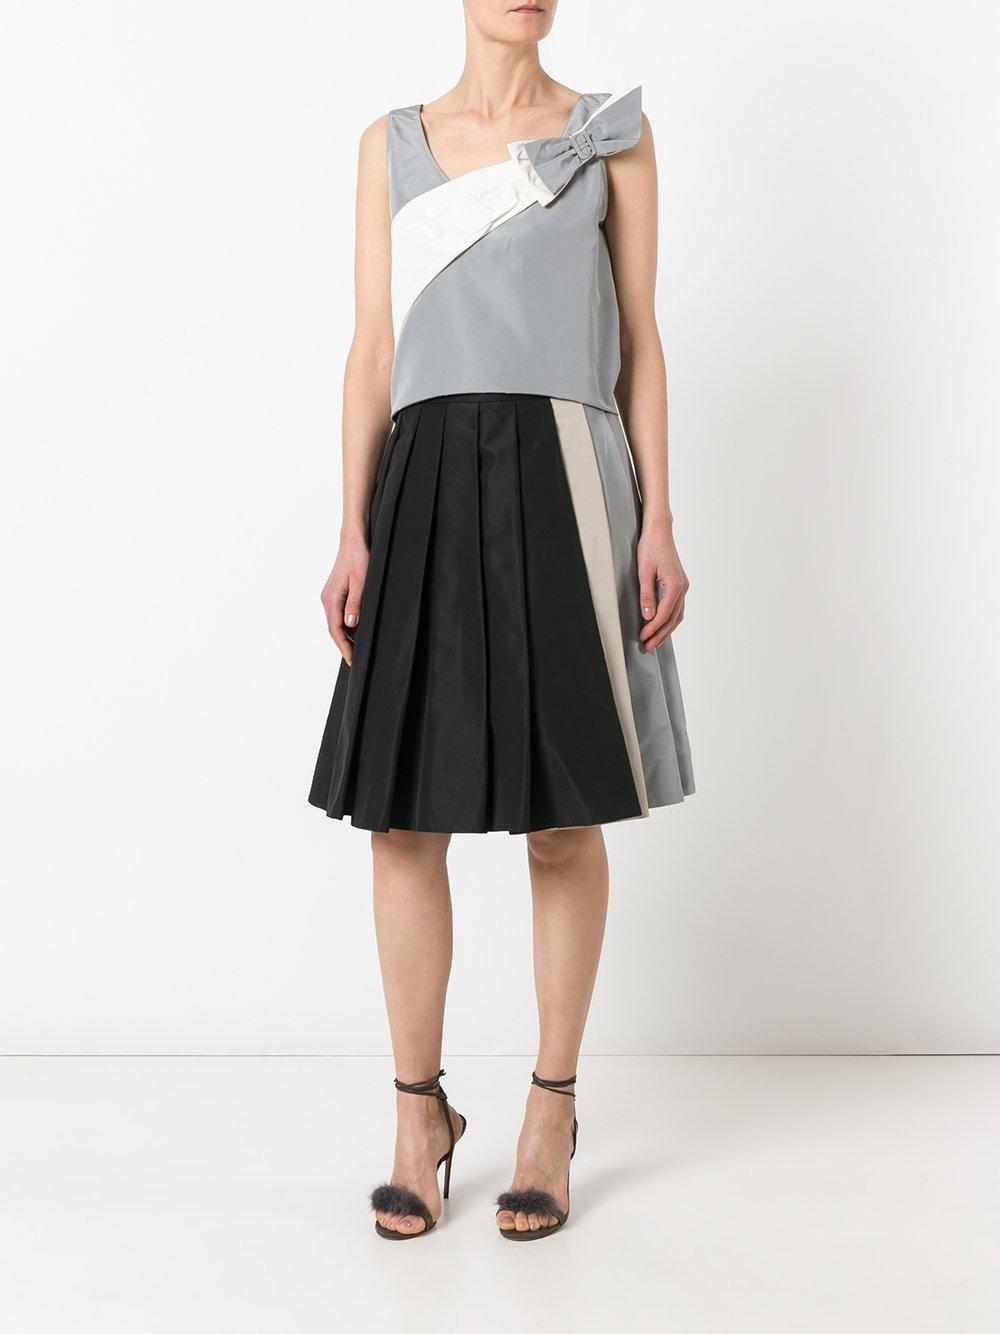 Prada - Midi Pleated Skirt - Women - Silk/cupro - 38 in Black